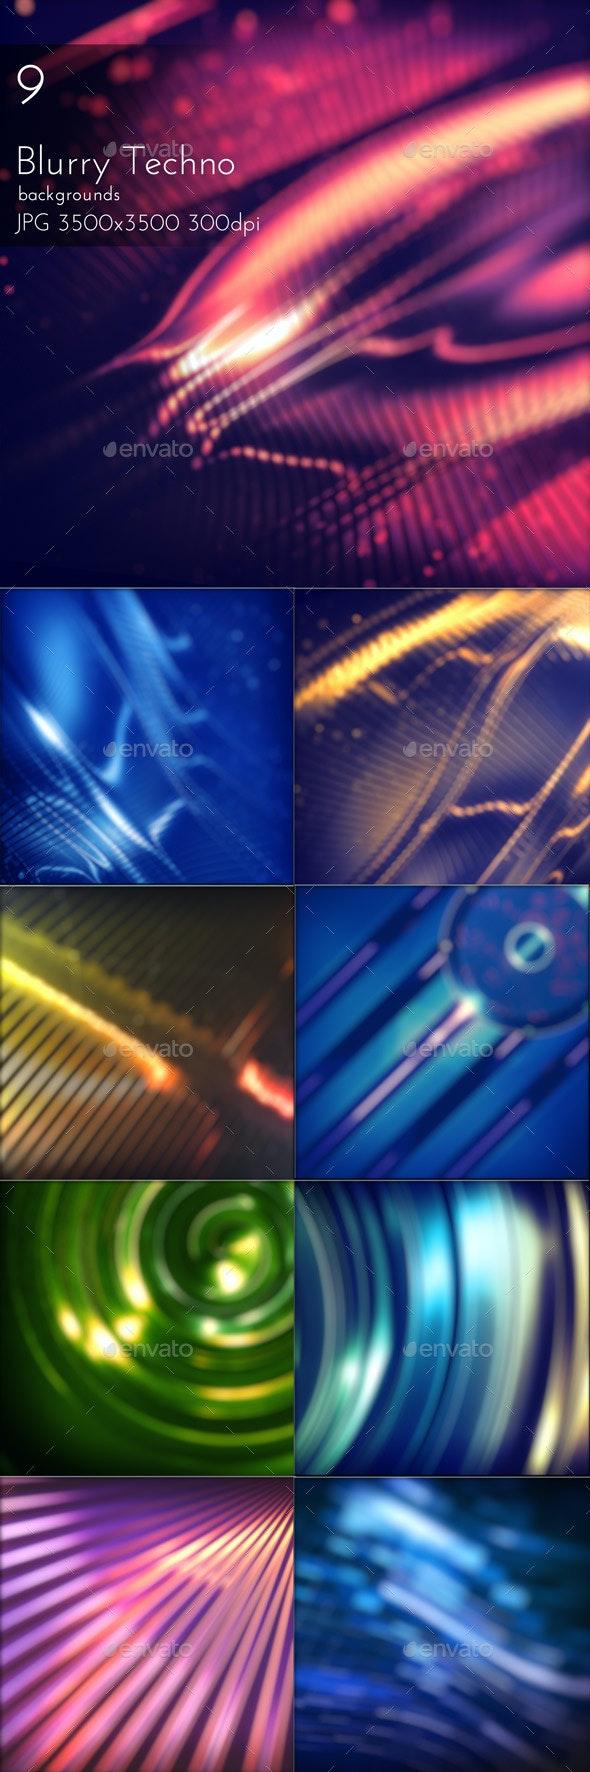 Blurred Techno Backgrounds - Tech / Futuristic Backgrounds